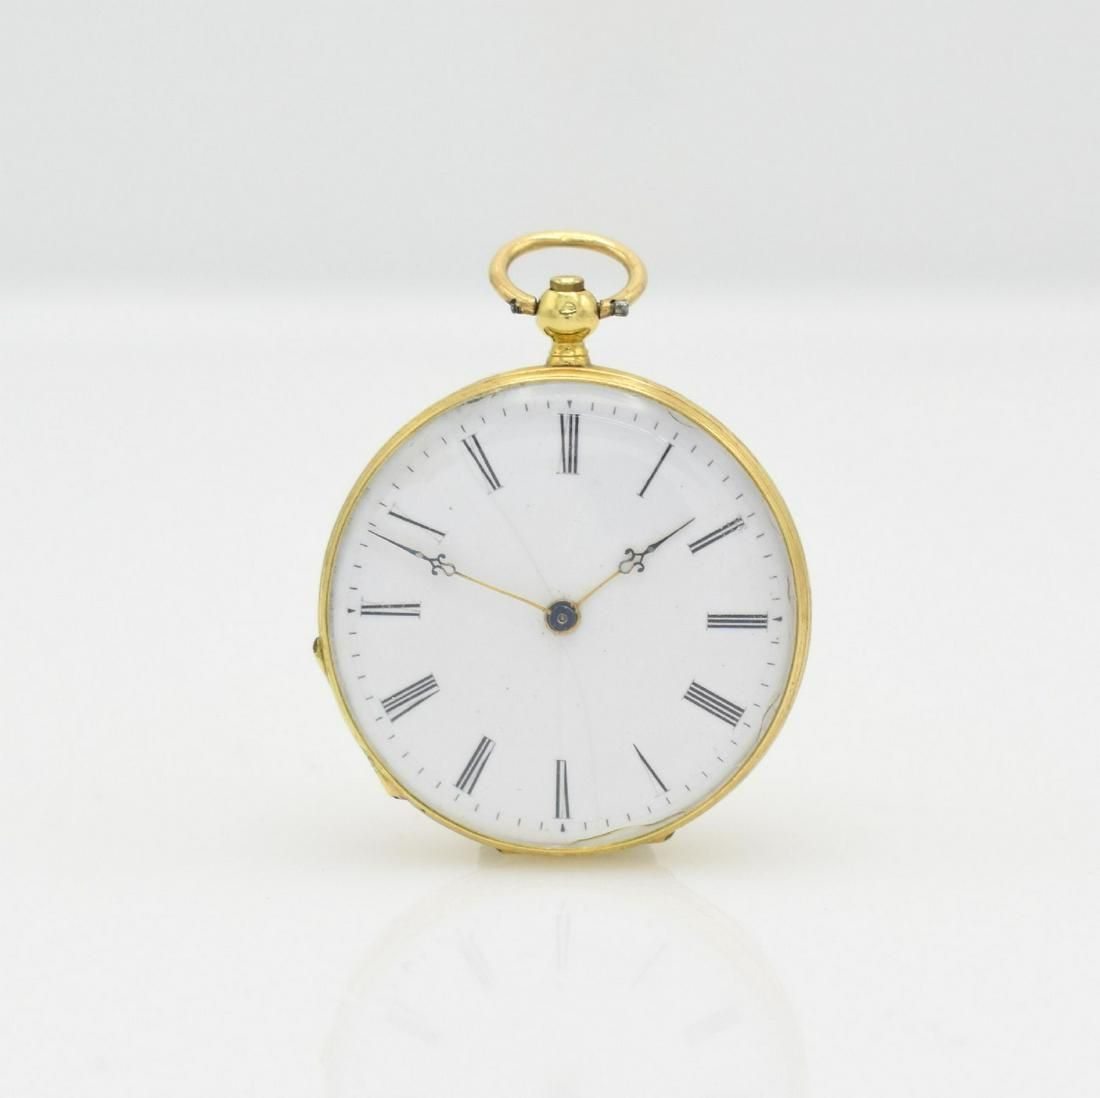 VACHERON Geneve 18k gold ladies pocket watch